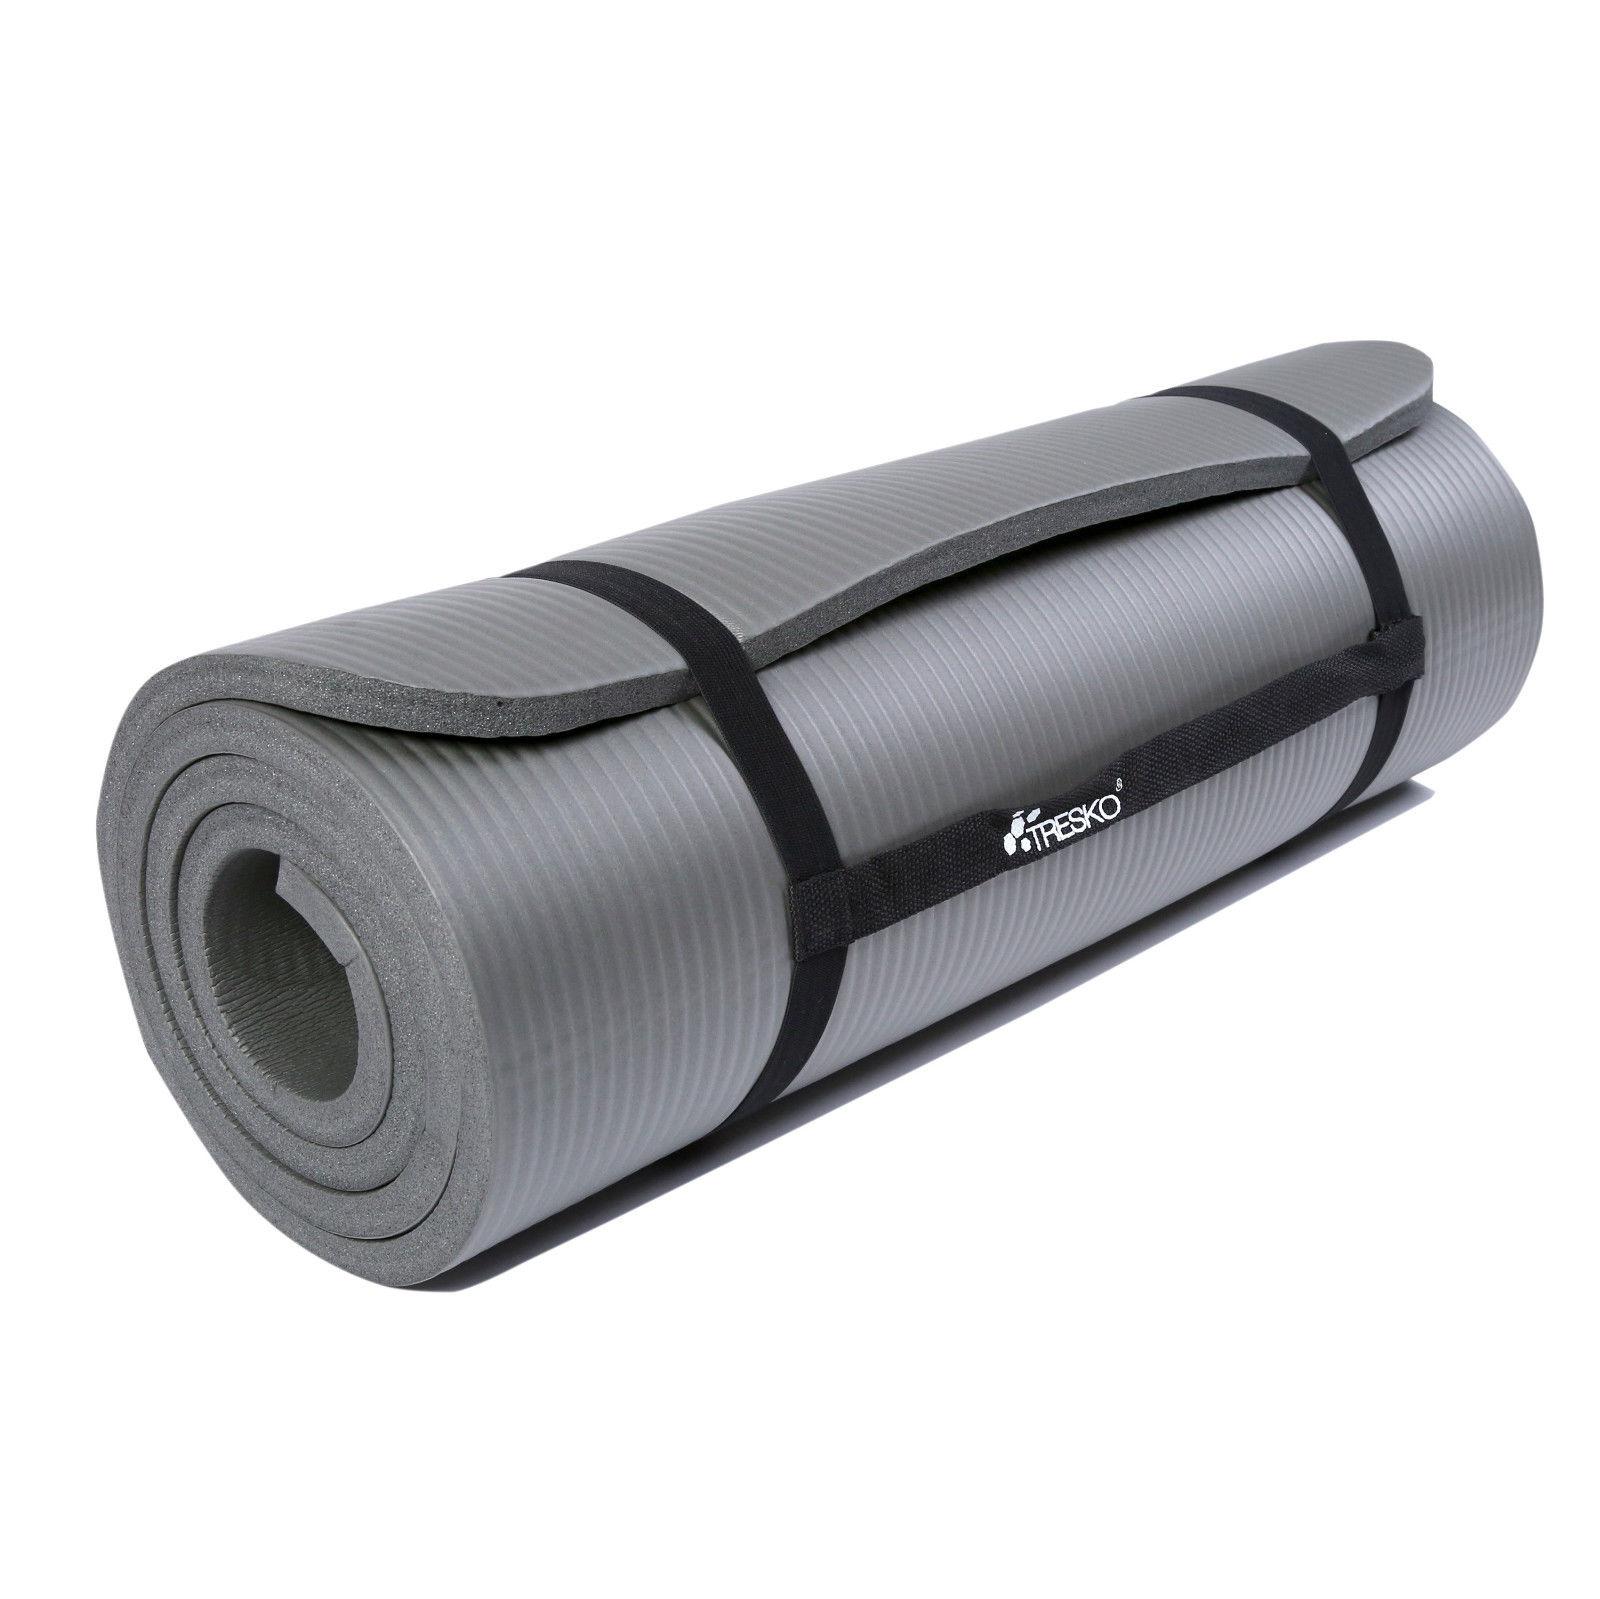 Yogamatte-Fitnessmatte-Gymnastikmatte-Pilates-Sportmatte-Bodenmatte-PHTHALATFREI Indexbild 10